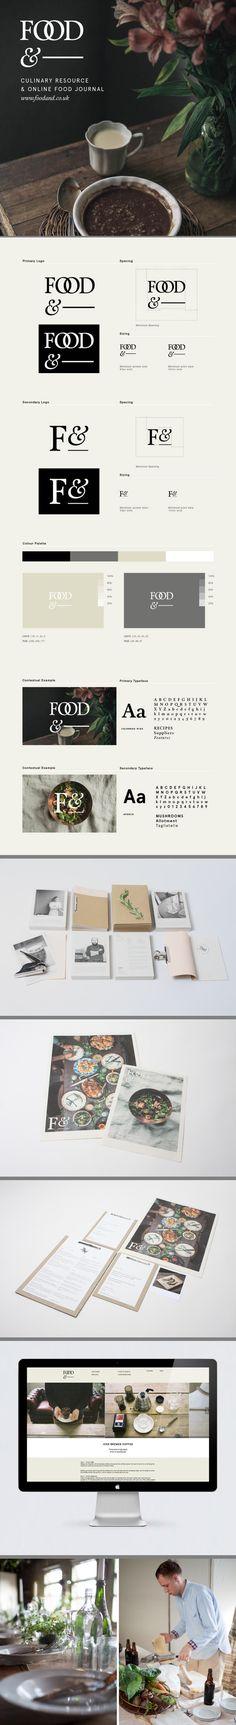 food& visual identity   #stationary #corporate #design #corporatedesign #identity #branding #marketing < repinned by www.BlickeDeeler.de   Take a look at www.LogoGestaltung-Hamburg.de